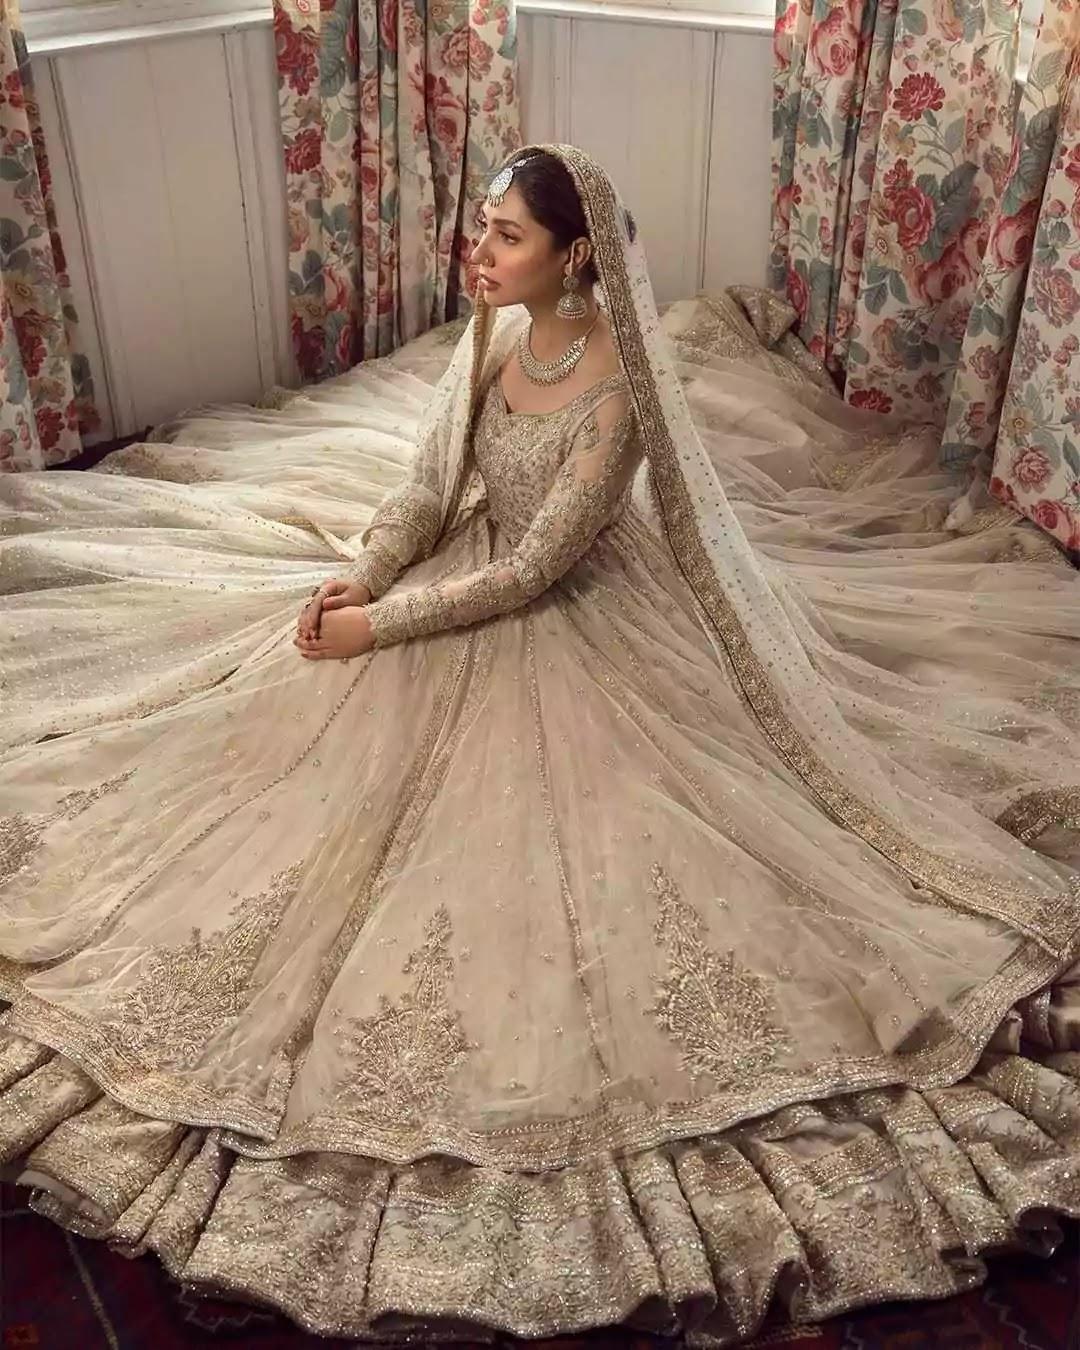 Latest Bridal Photoshoot of Mahira Khan